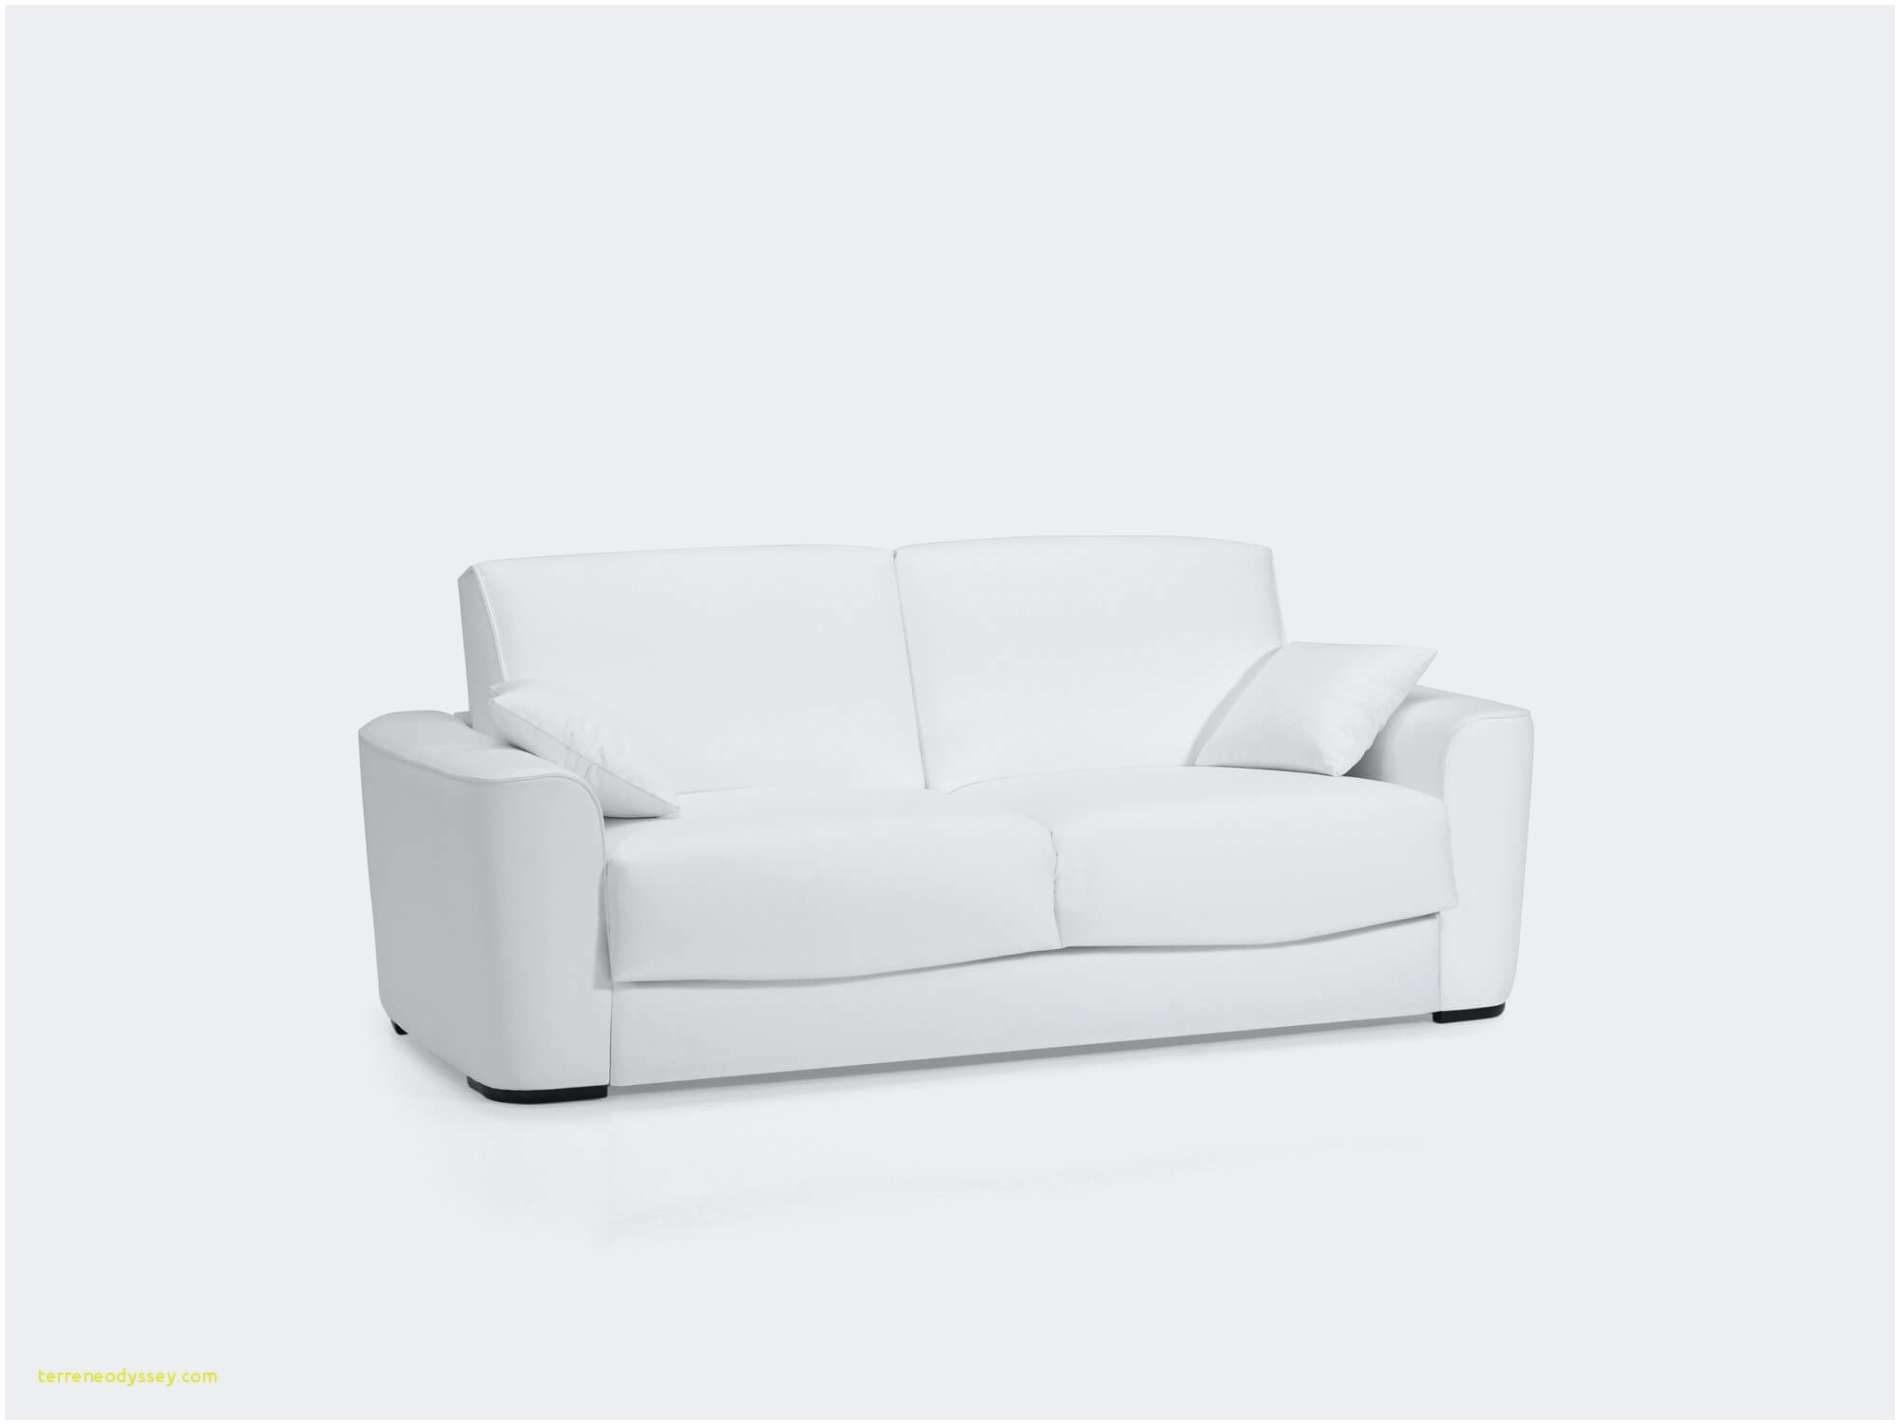 Canapé Lit Convertible Ikea Belle Impressionnant sove Canapé Moderne Convertible — sovedis Aquatabs